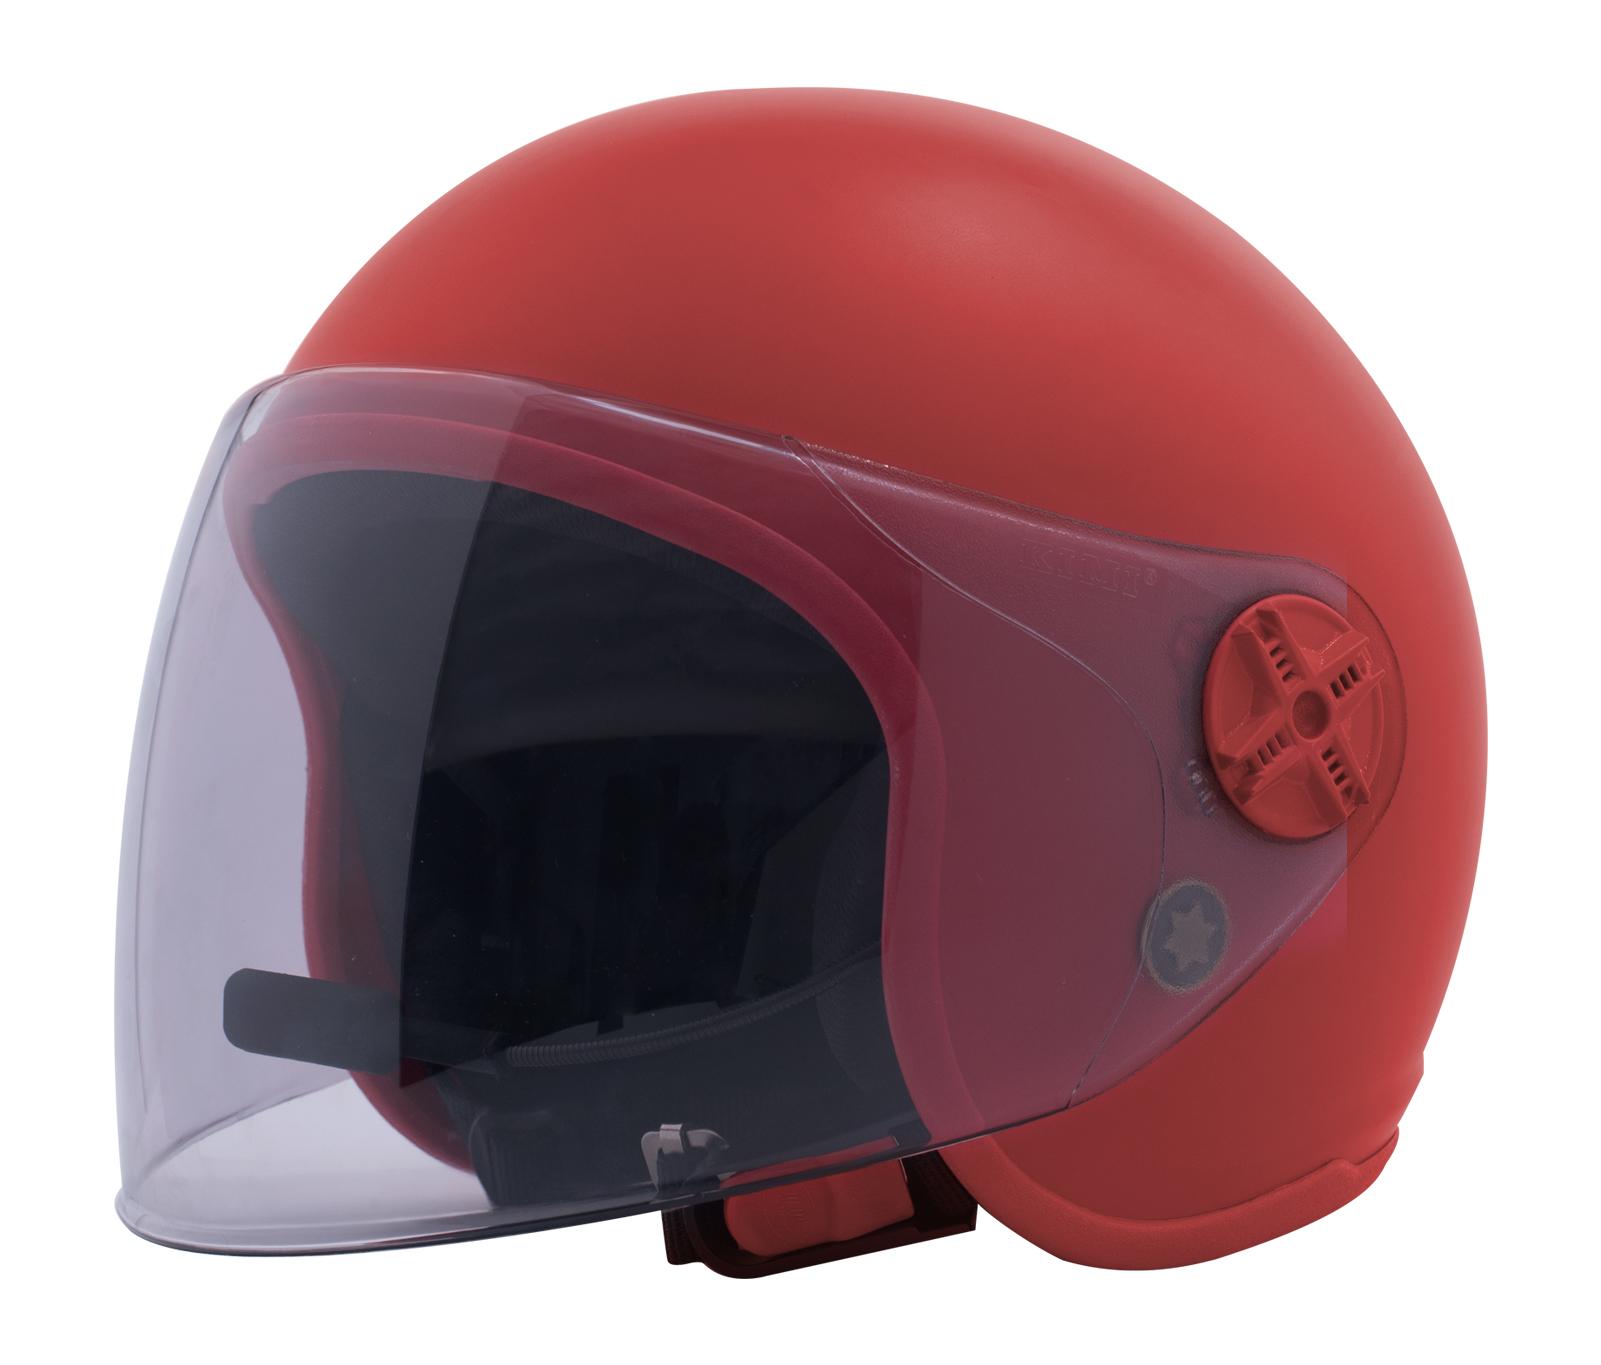 Version 2 - Mũ bảo hiểm bluetooth MPL